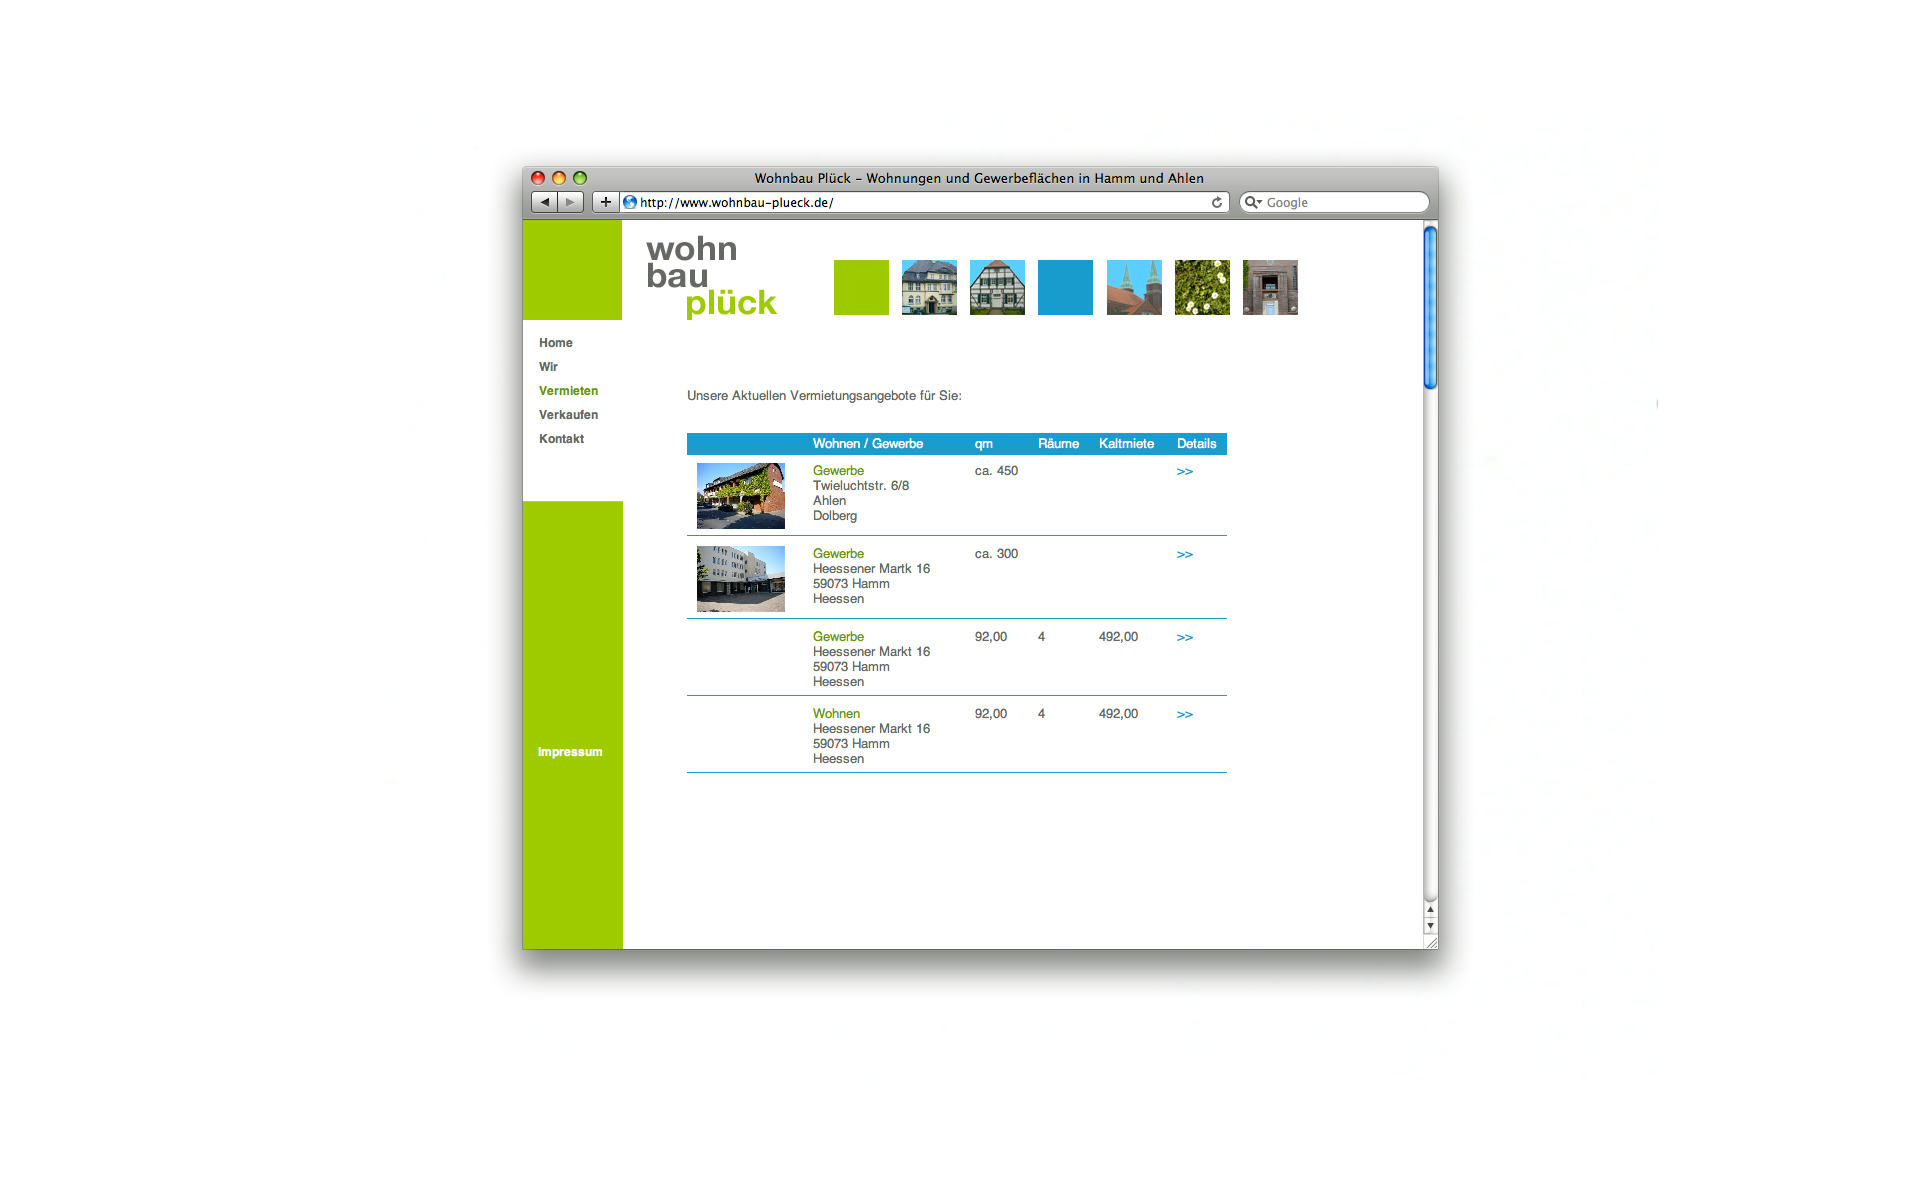 Wohnbau Plueck Website Webgestaltung